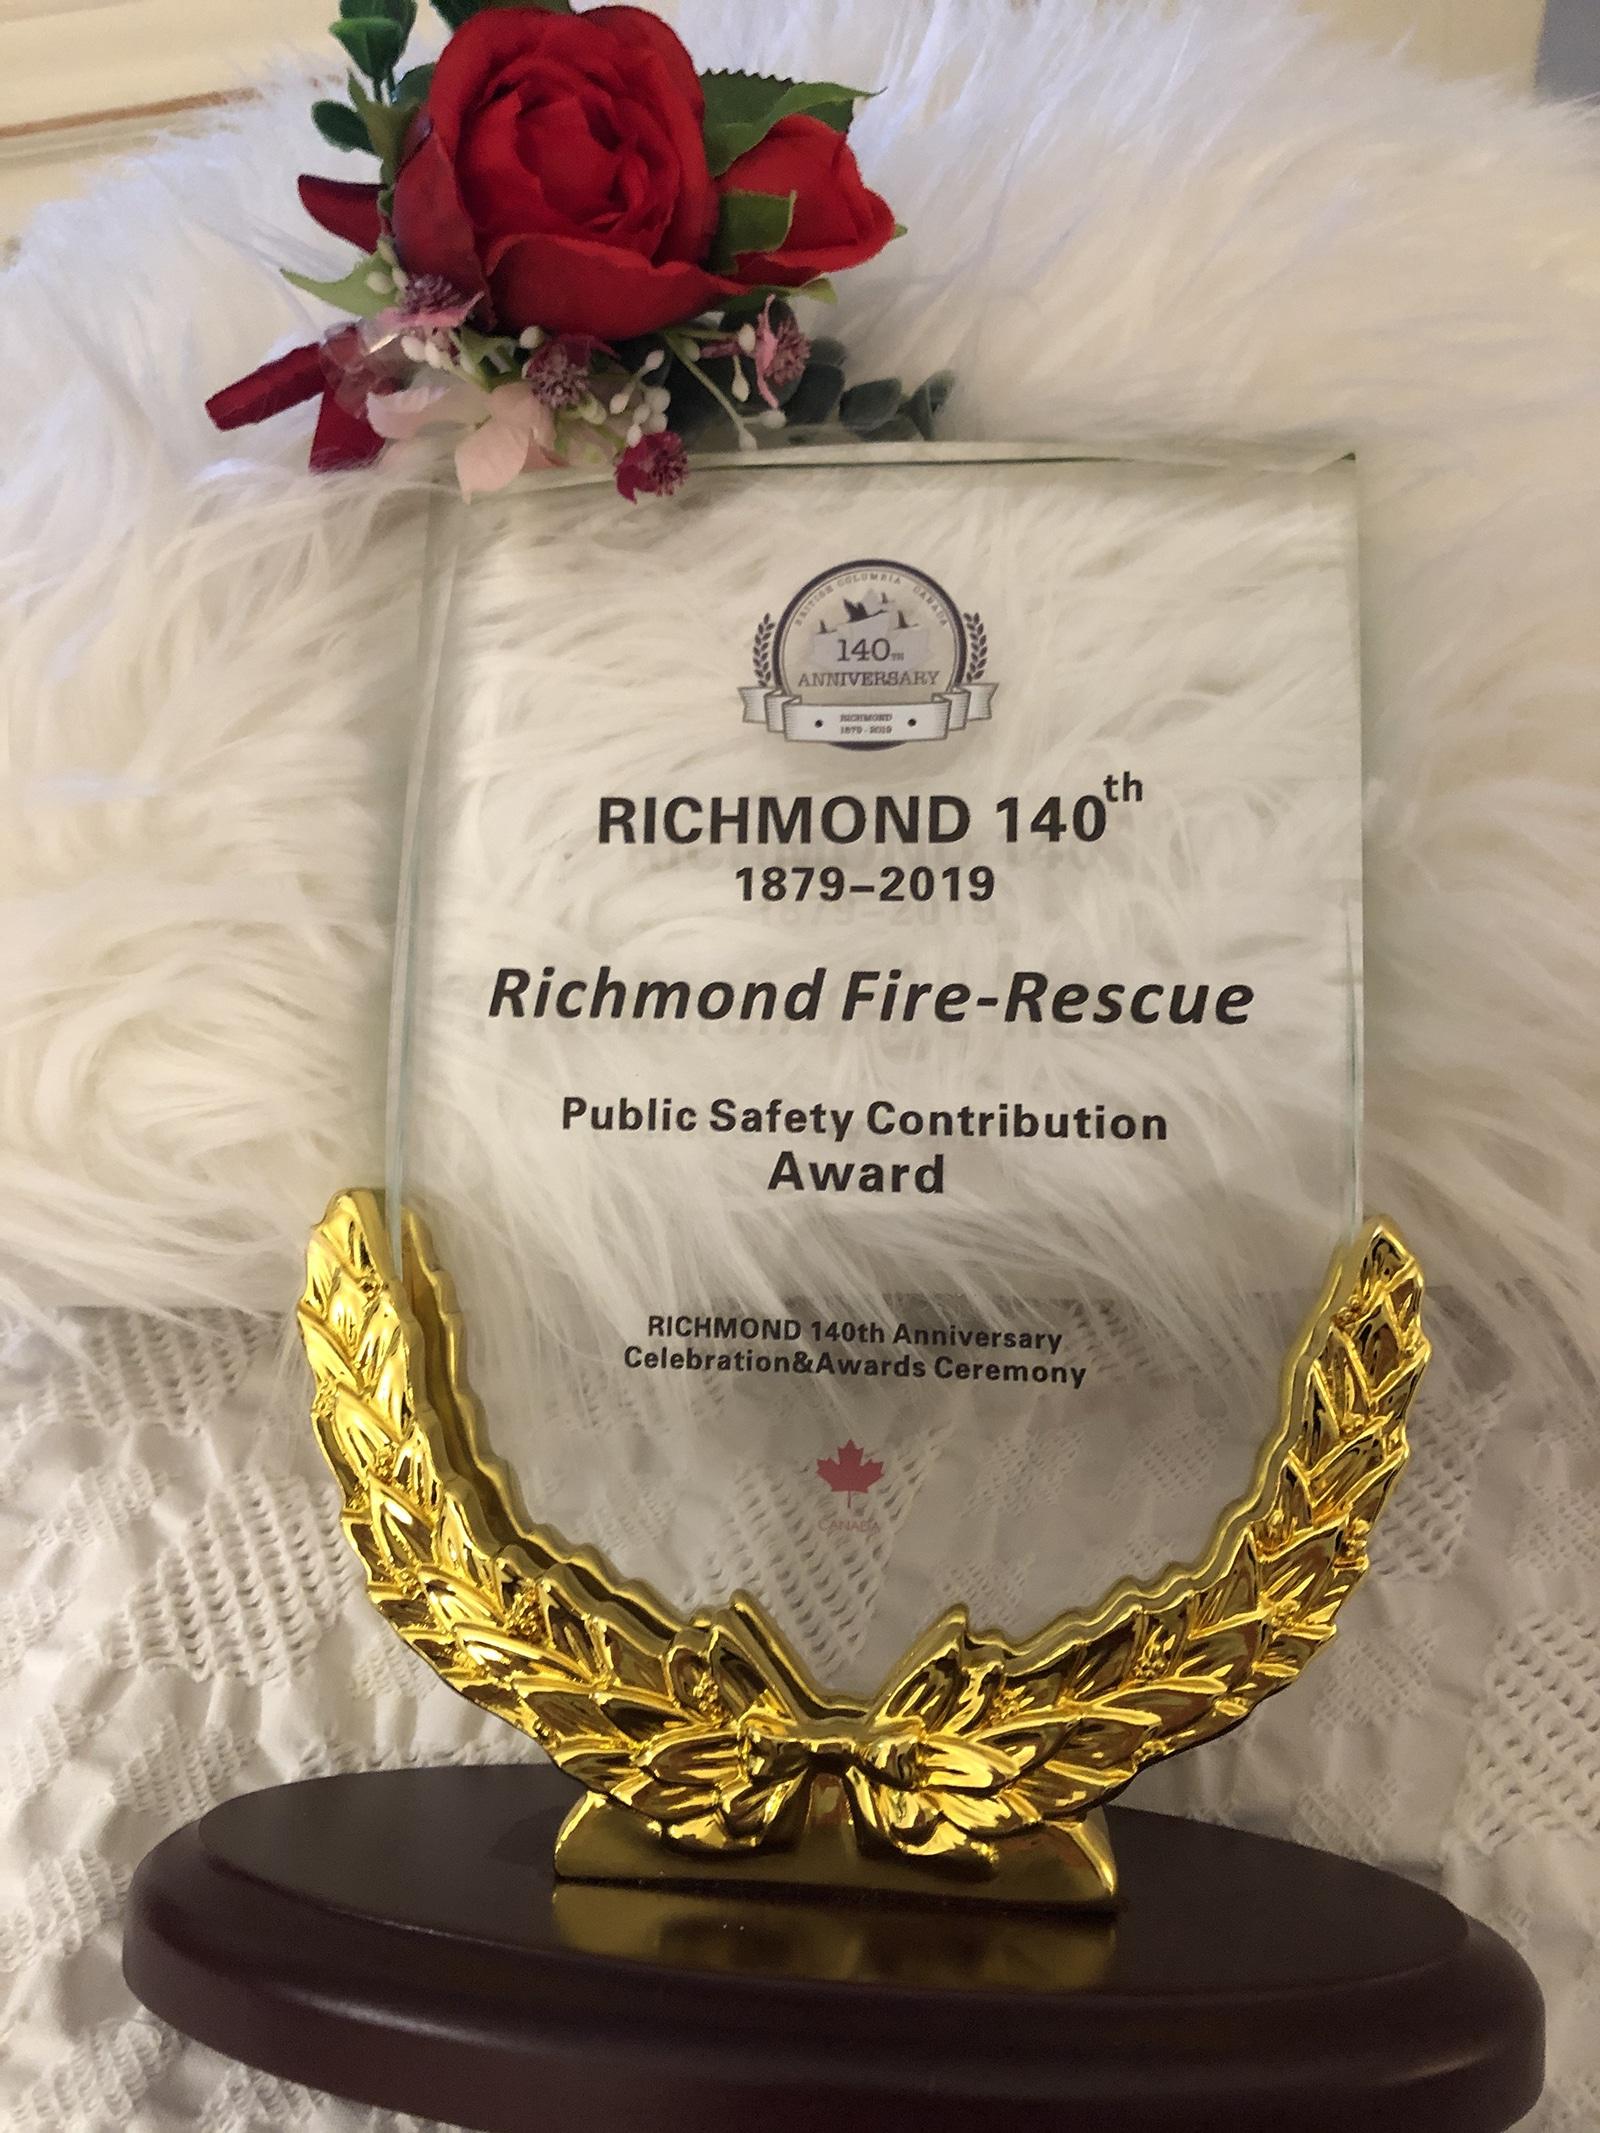 Richmond Fire-Rescue wins Community Safety Award